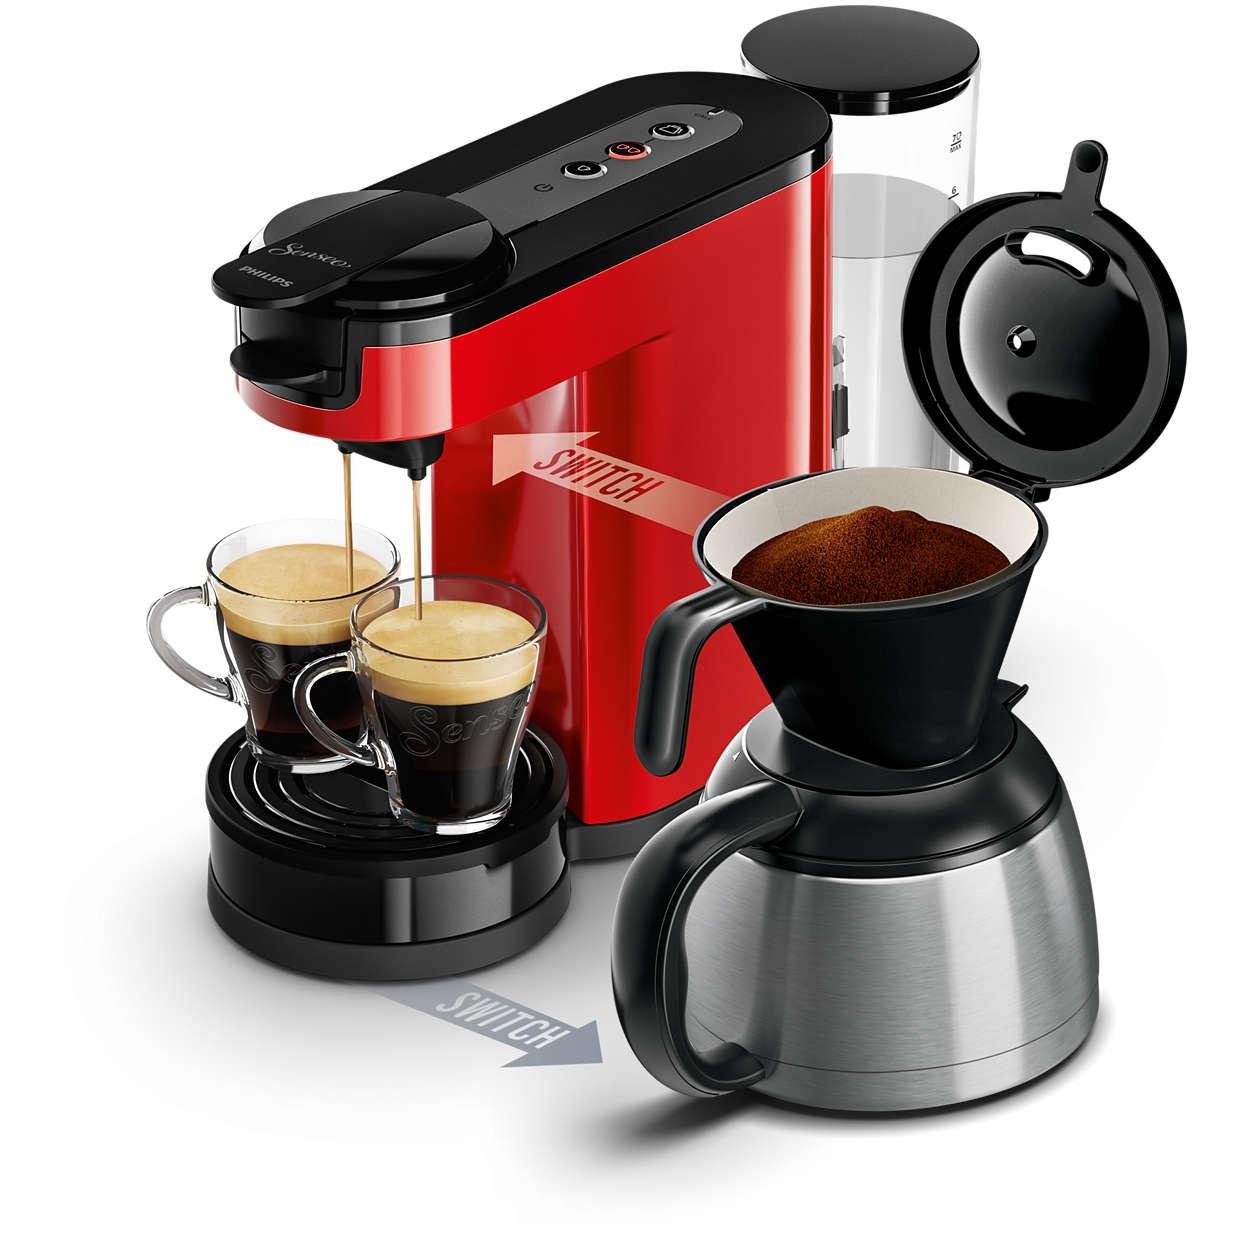 switch machine caf dosettes et filtre hd7892 81 senseo. Black Bedroom Furniture Sets. Home Design Ideas